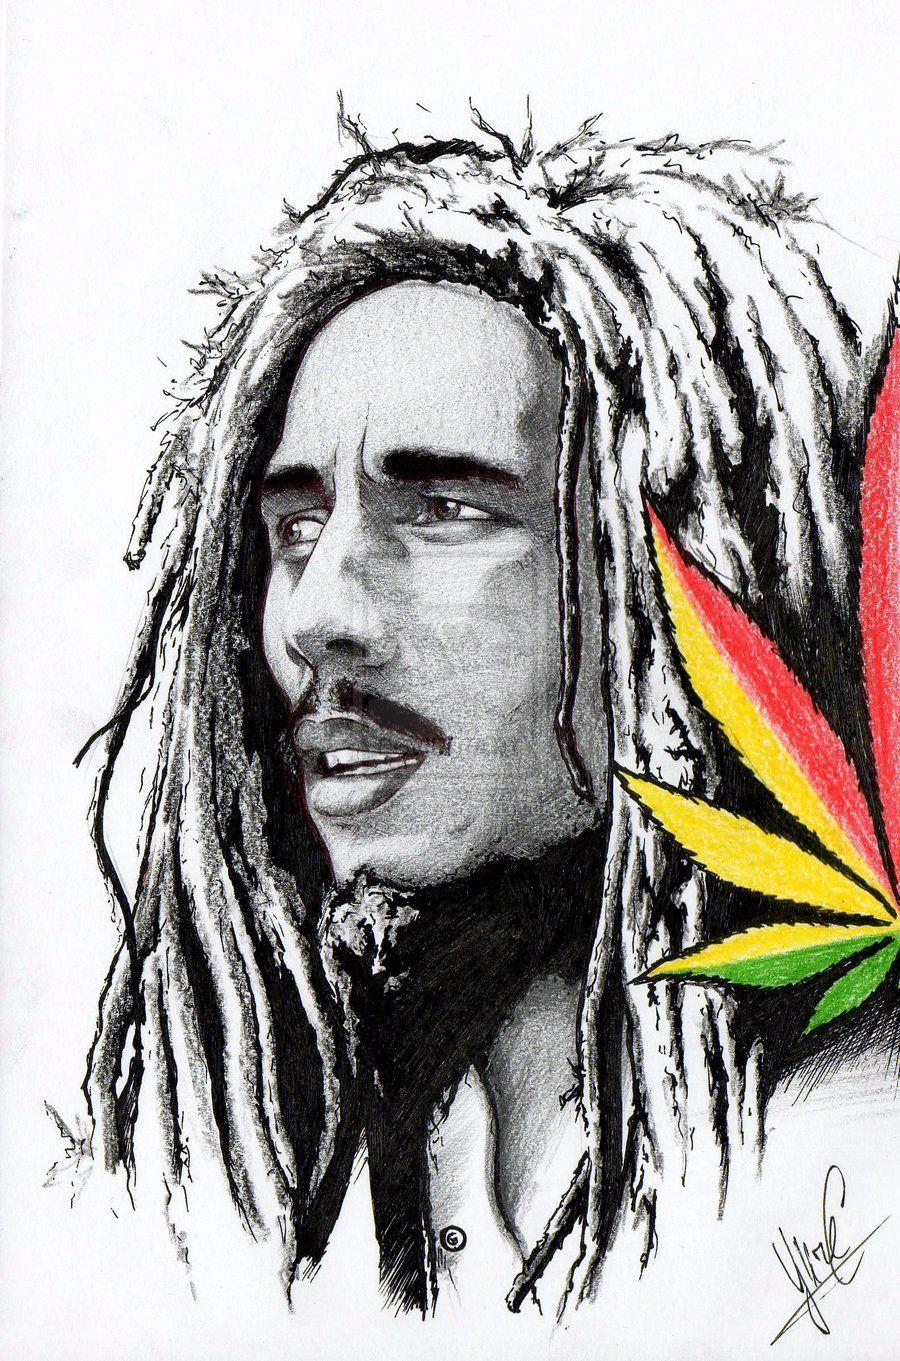 Essay, Research Paper: Bob Marley